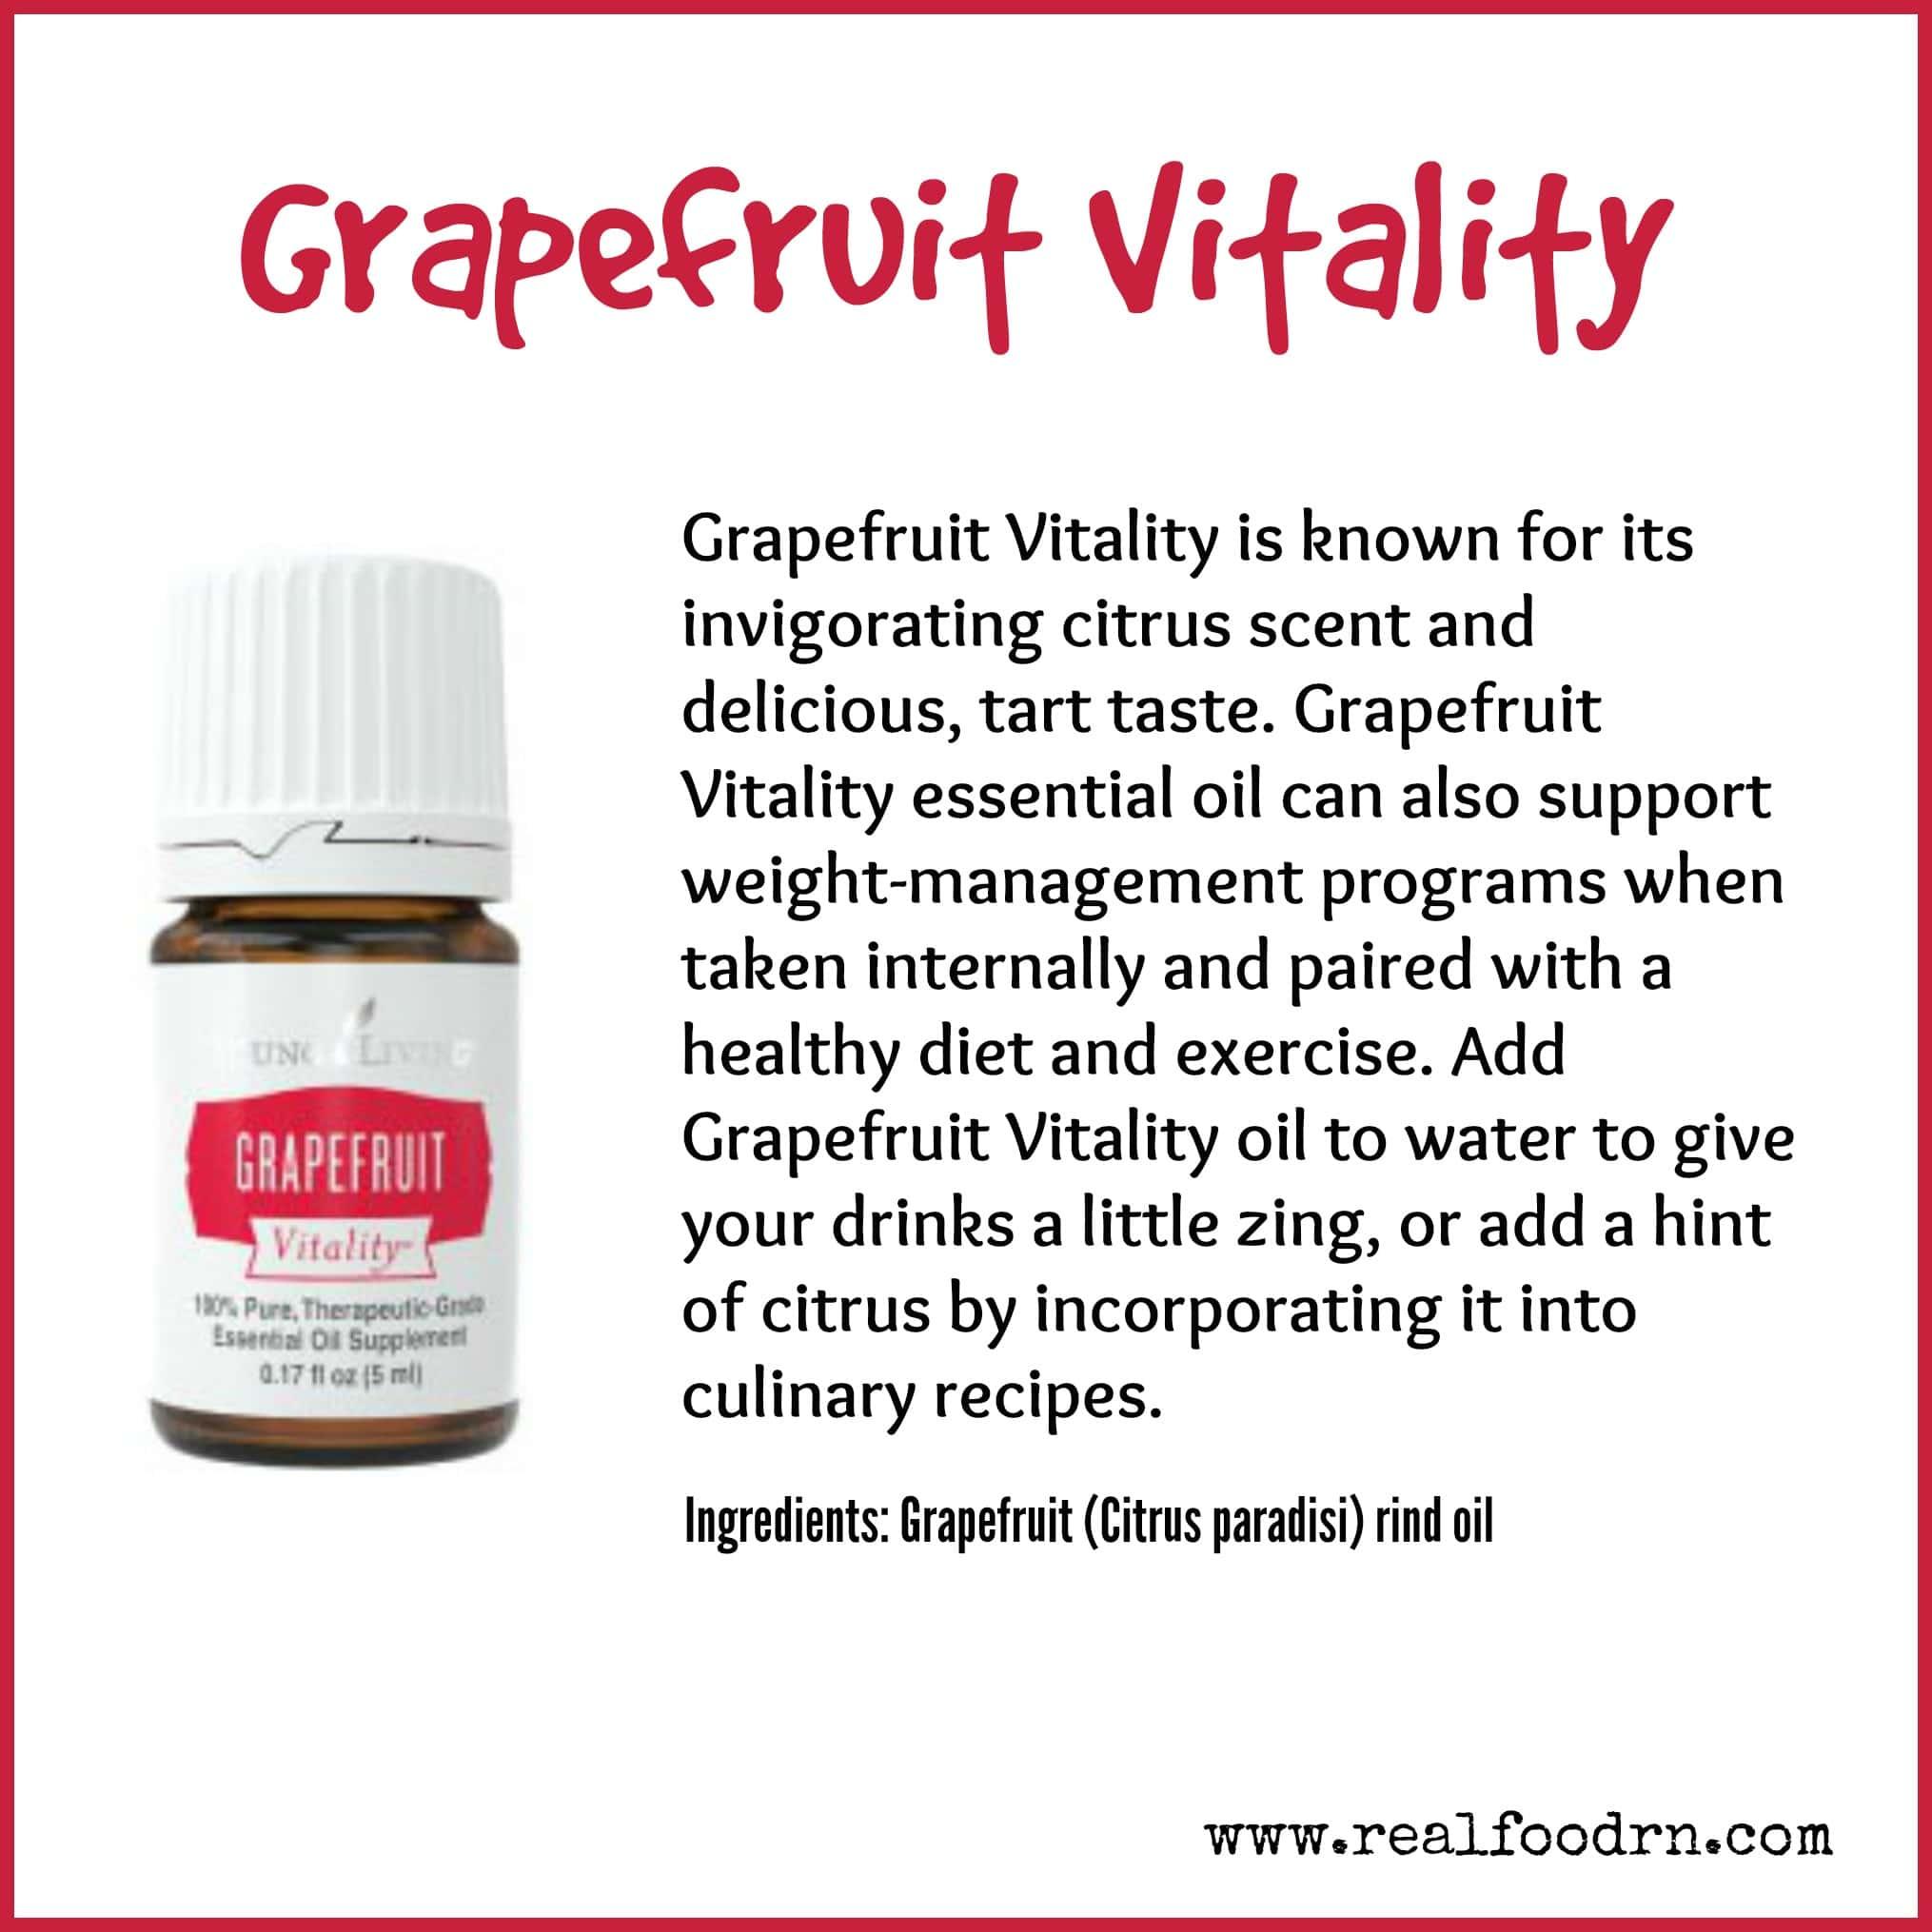 Grapefruit Vitality